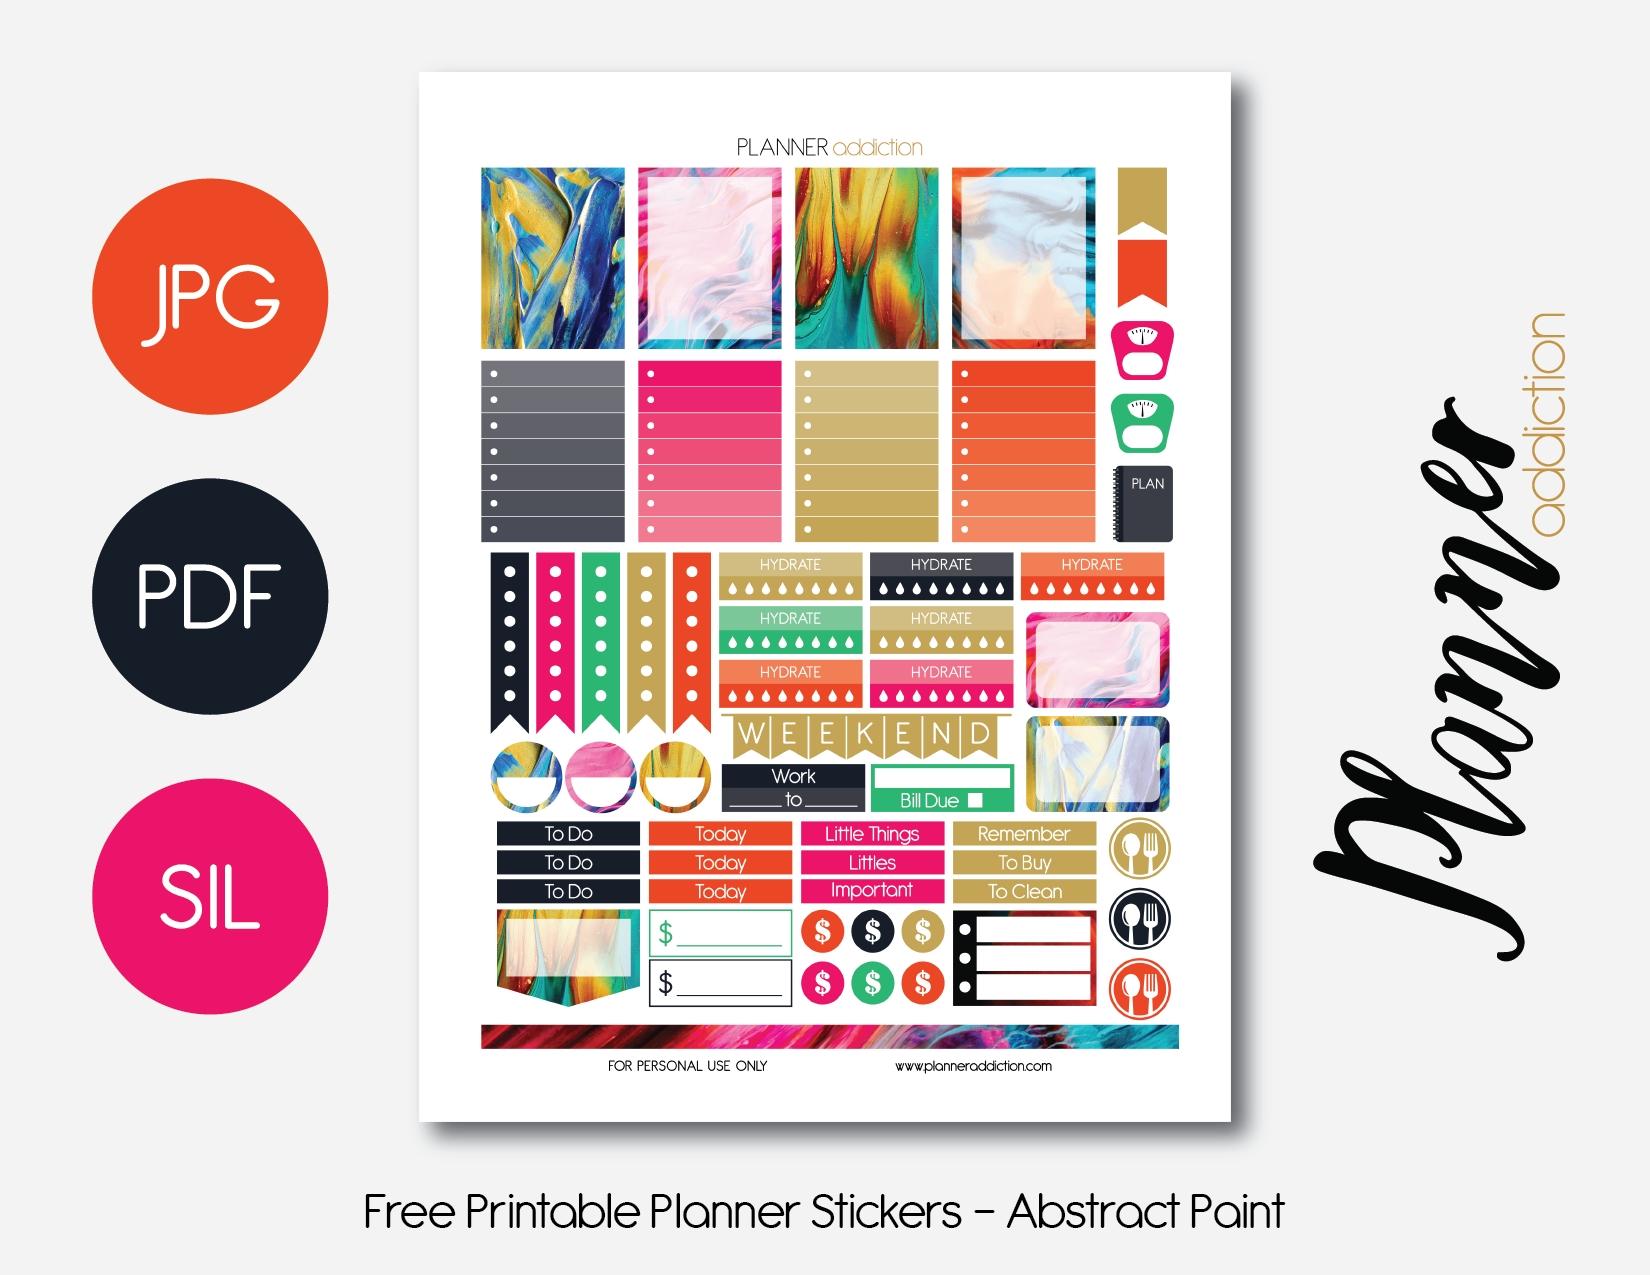 Planner Addiction – Free Diy Printables For Planner  Free Printable Number Labels 1-31